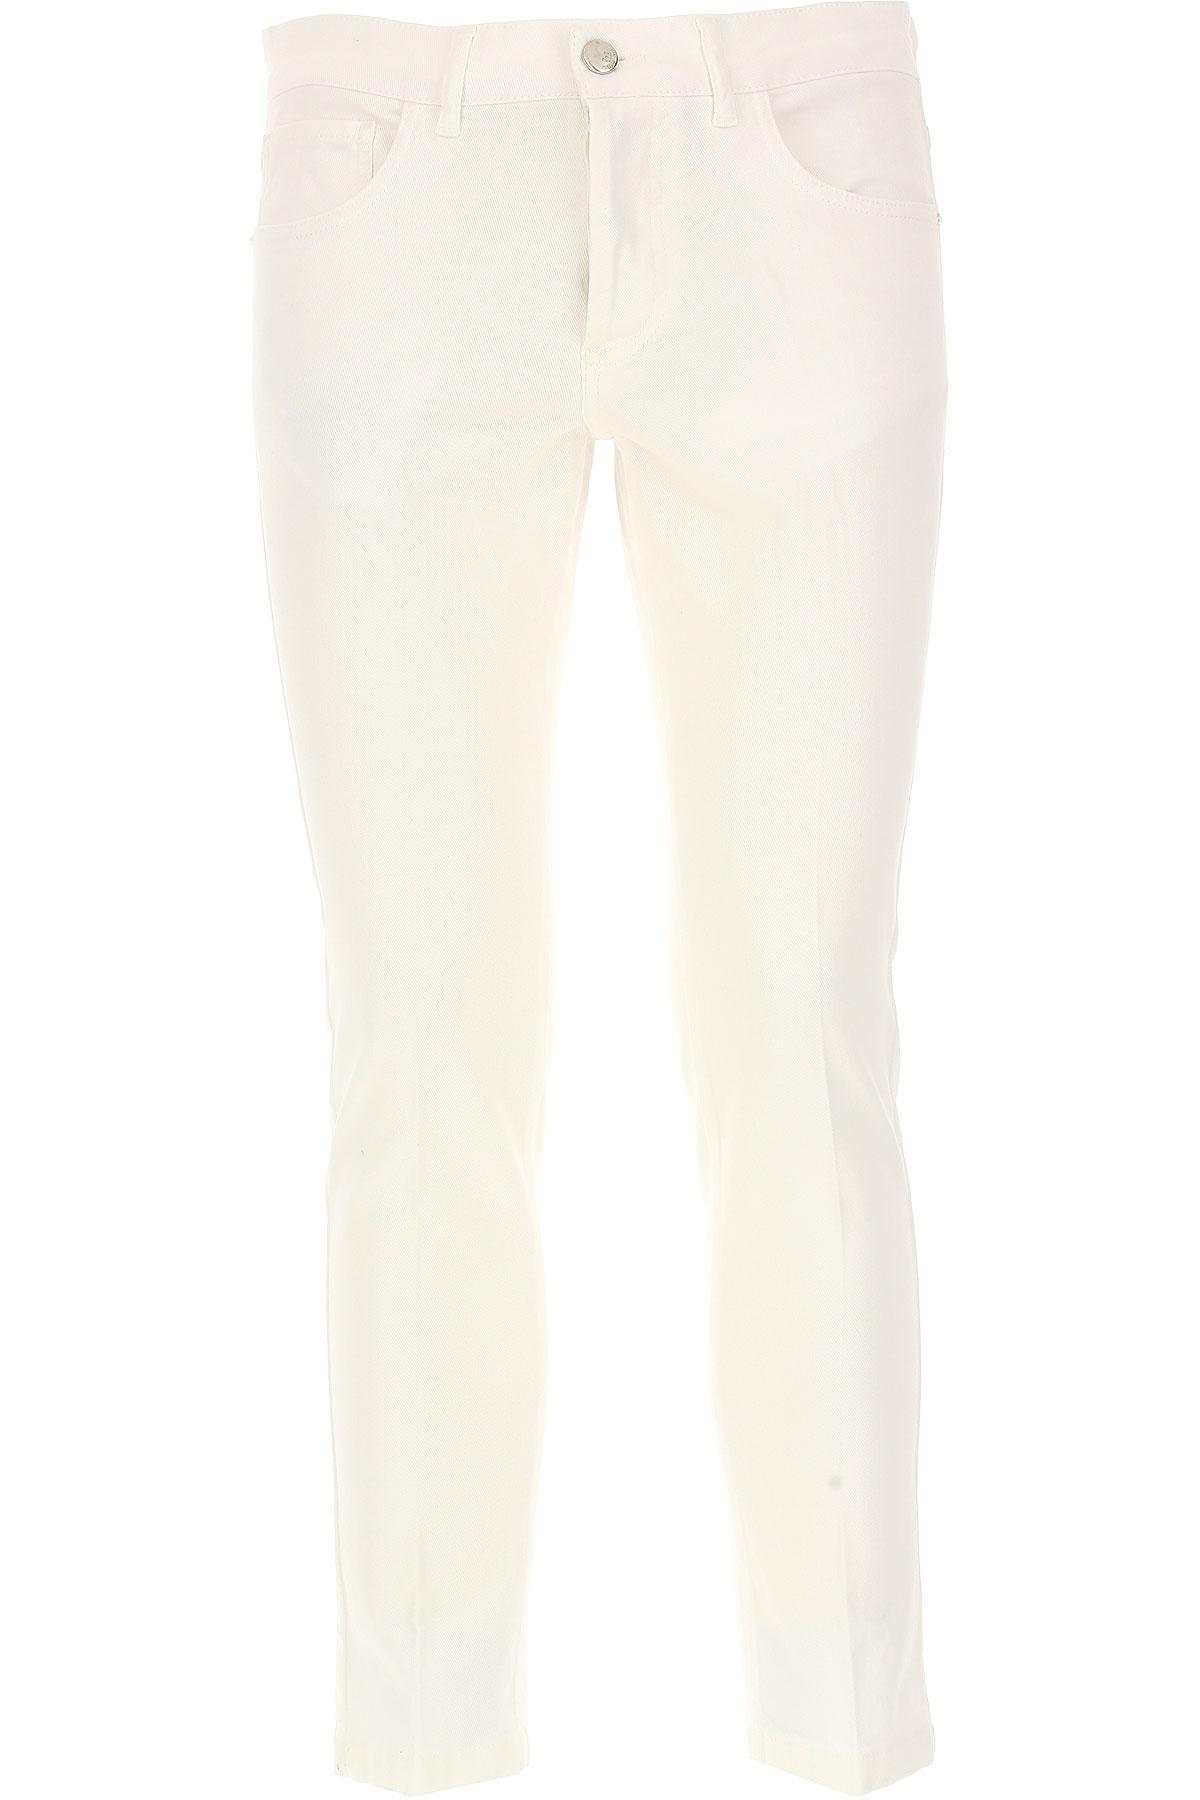 Image of Entre Amis Jeans On Sale, White, Cotton, 2017, 32 35 36